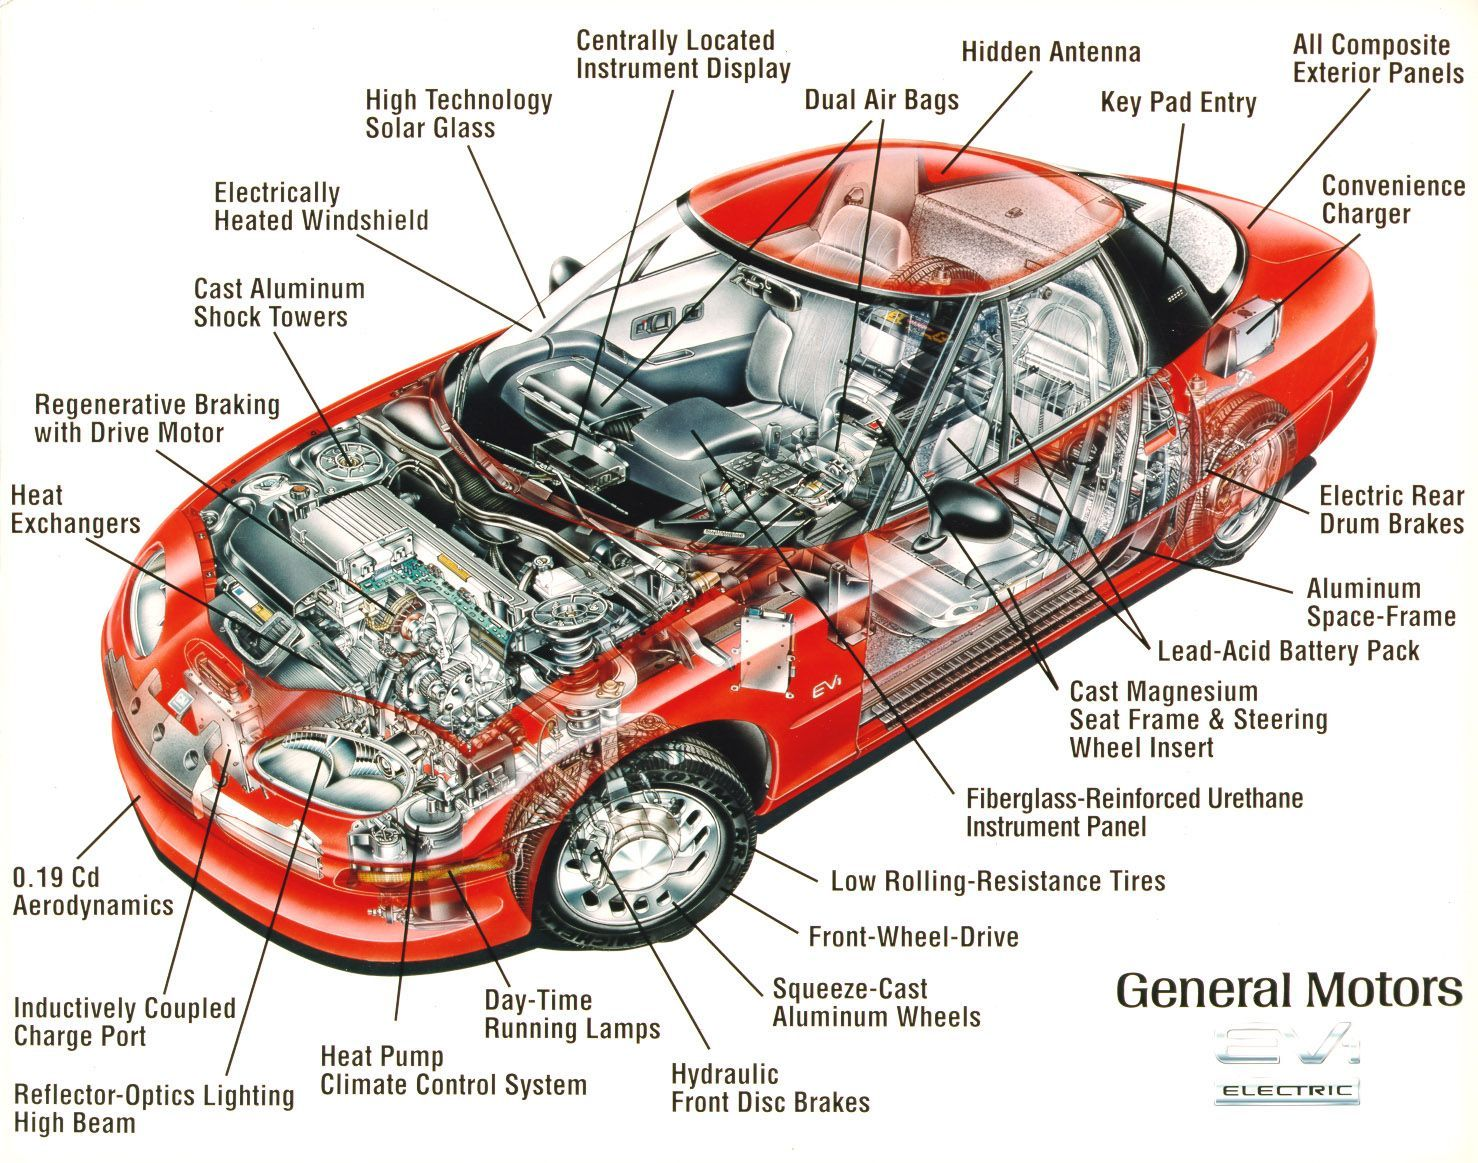 Exotic Car Schematics Wiring Diagram Compilation Electric Motor Schematic Basic Engine Parts General Pinte